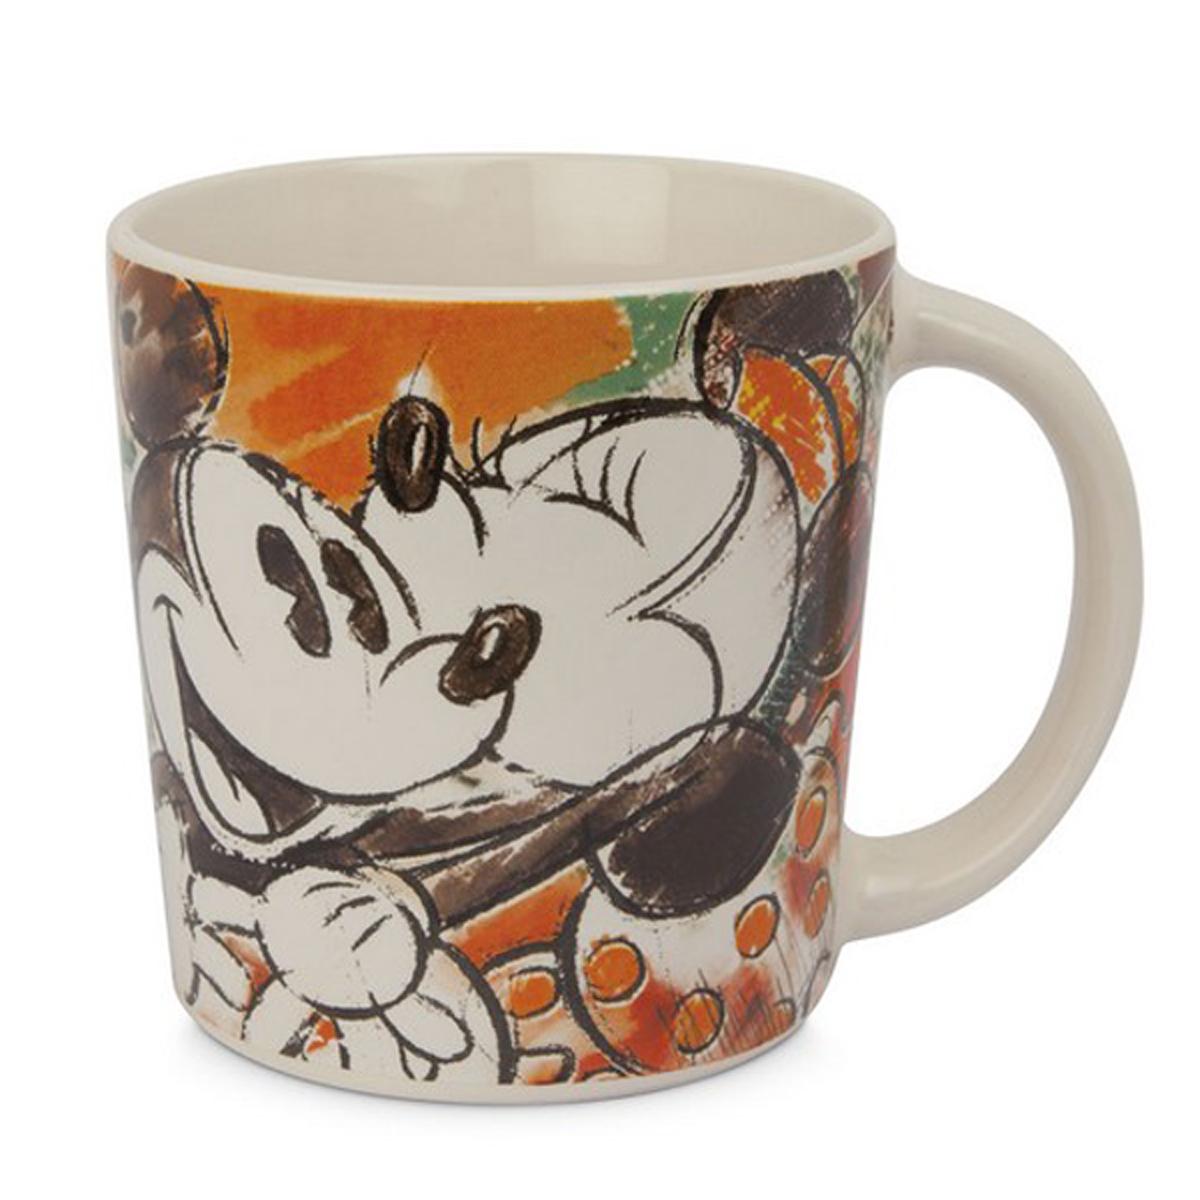 Mug céramique \'Mickey & Minnie\' orange - 95x90 mm (390 ml) - [A1481]